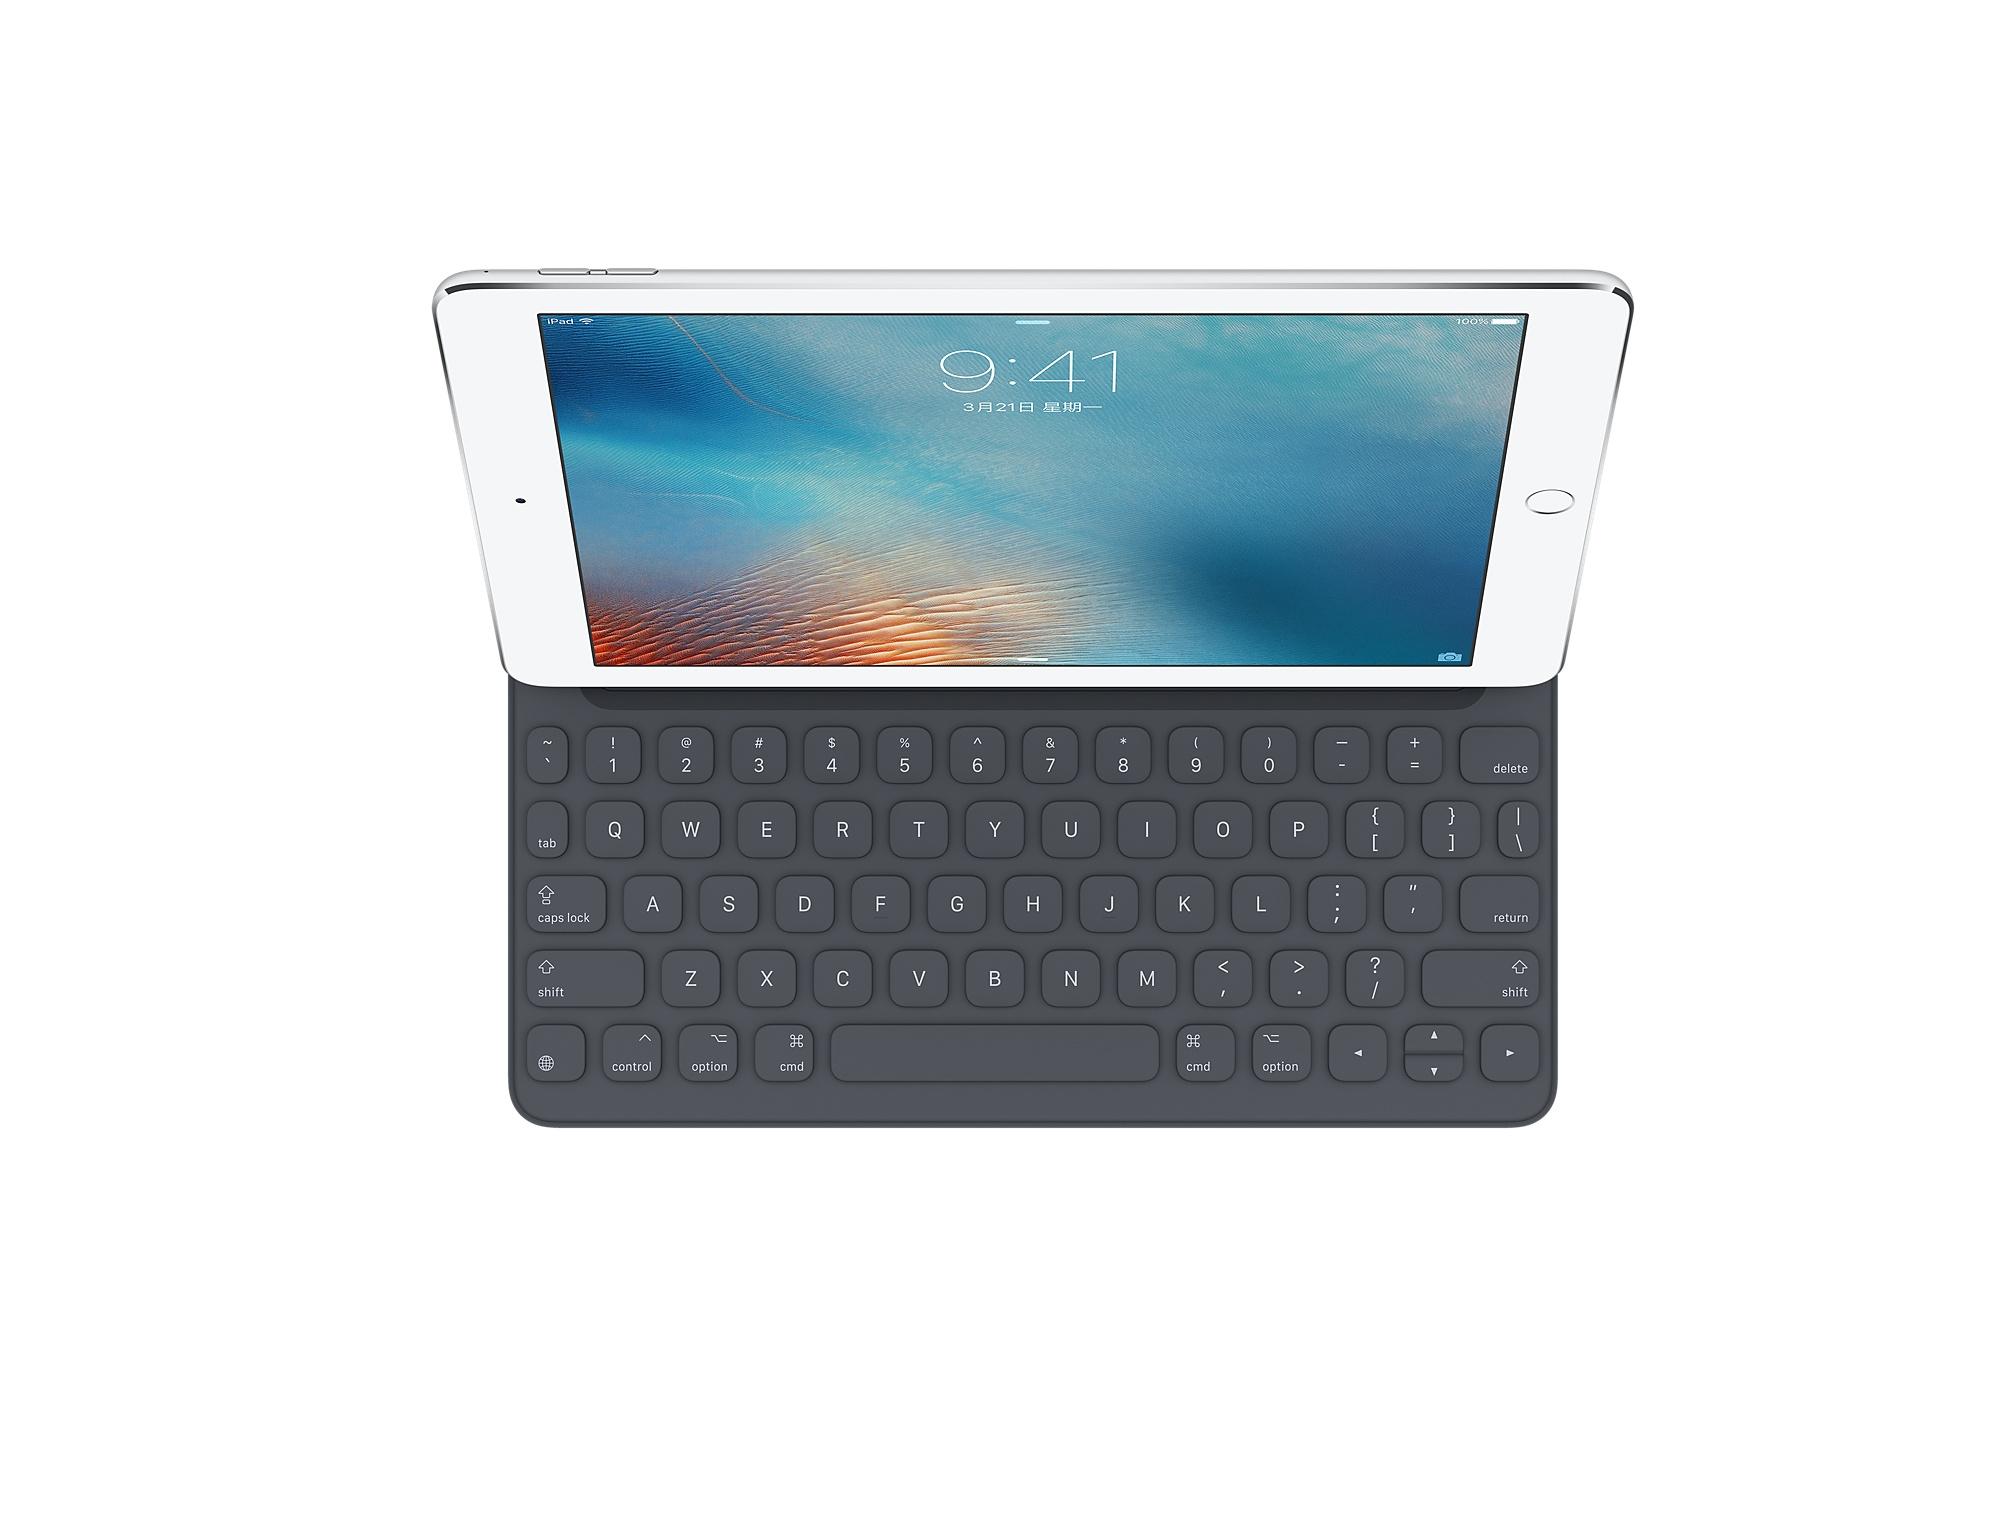 Apple 9.7 吋 iPad Pro Wi-Fi 32GB 價錢,規格及用家意見 - 香港格價網 Price.com.hk